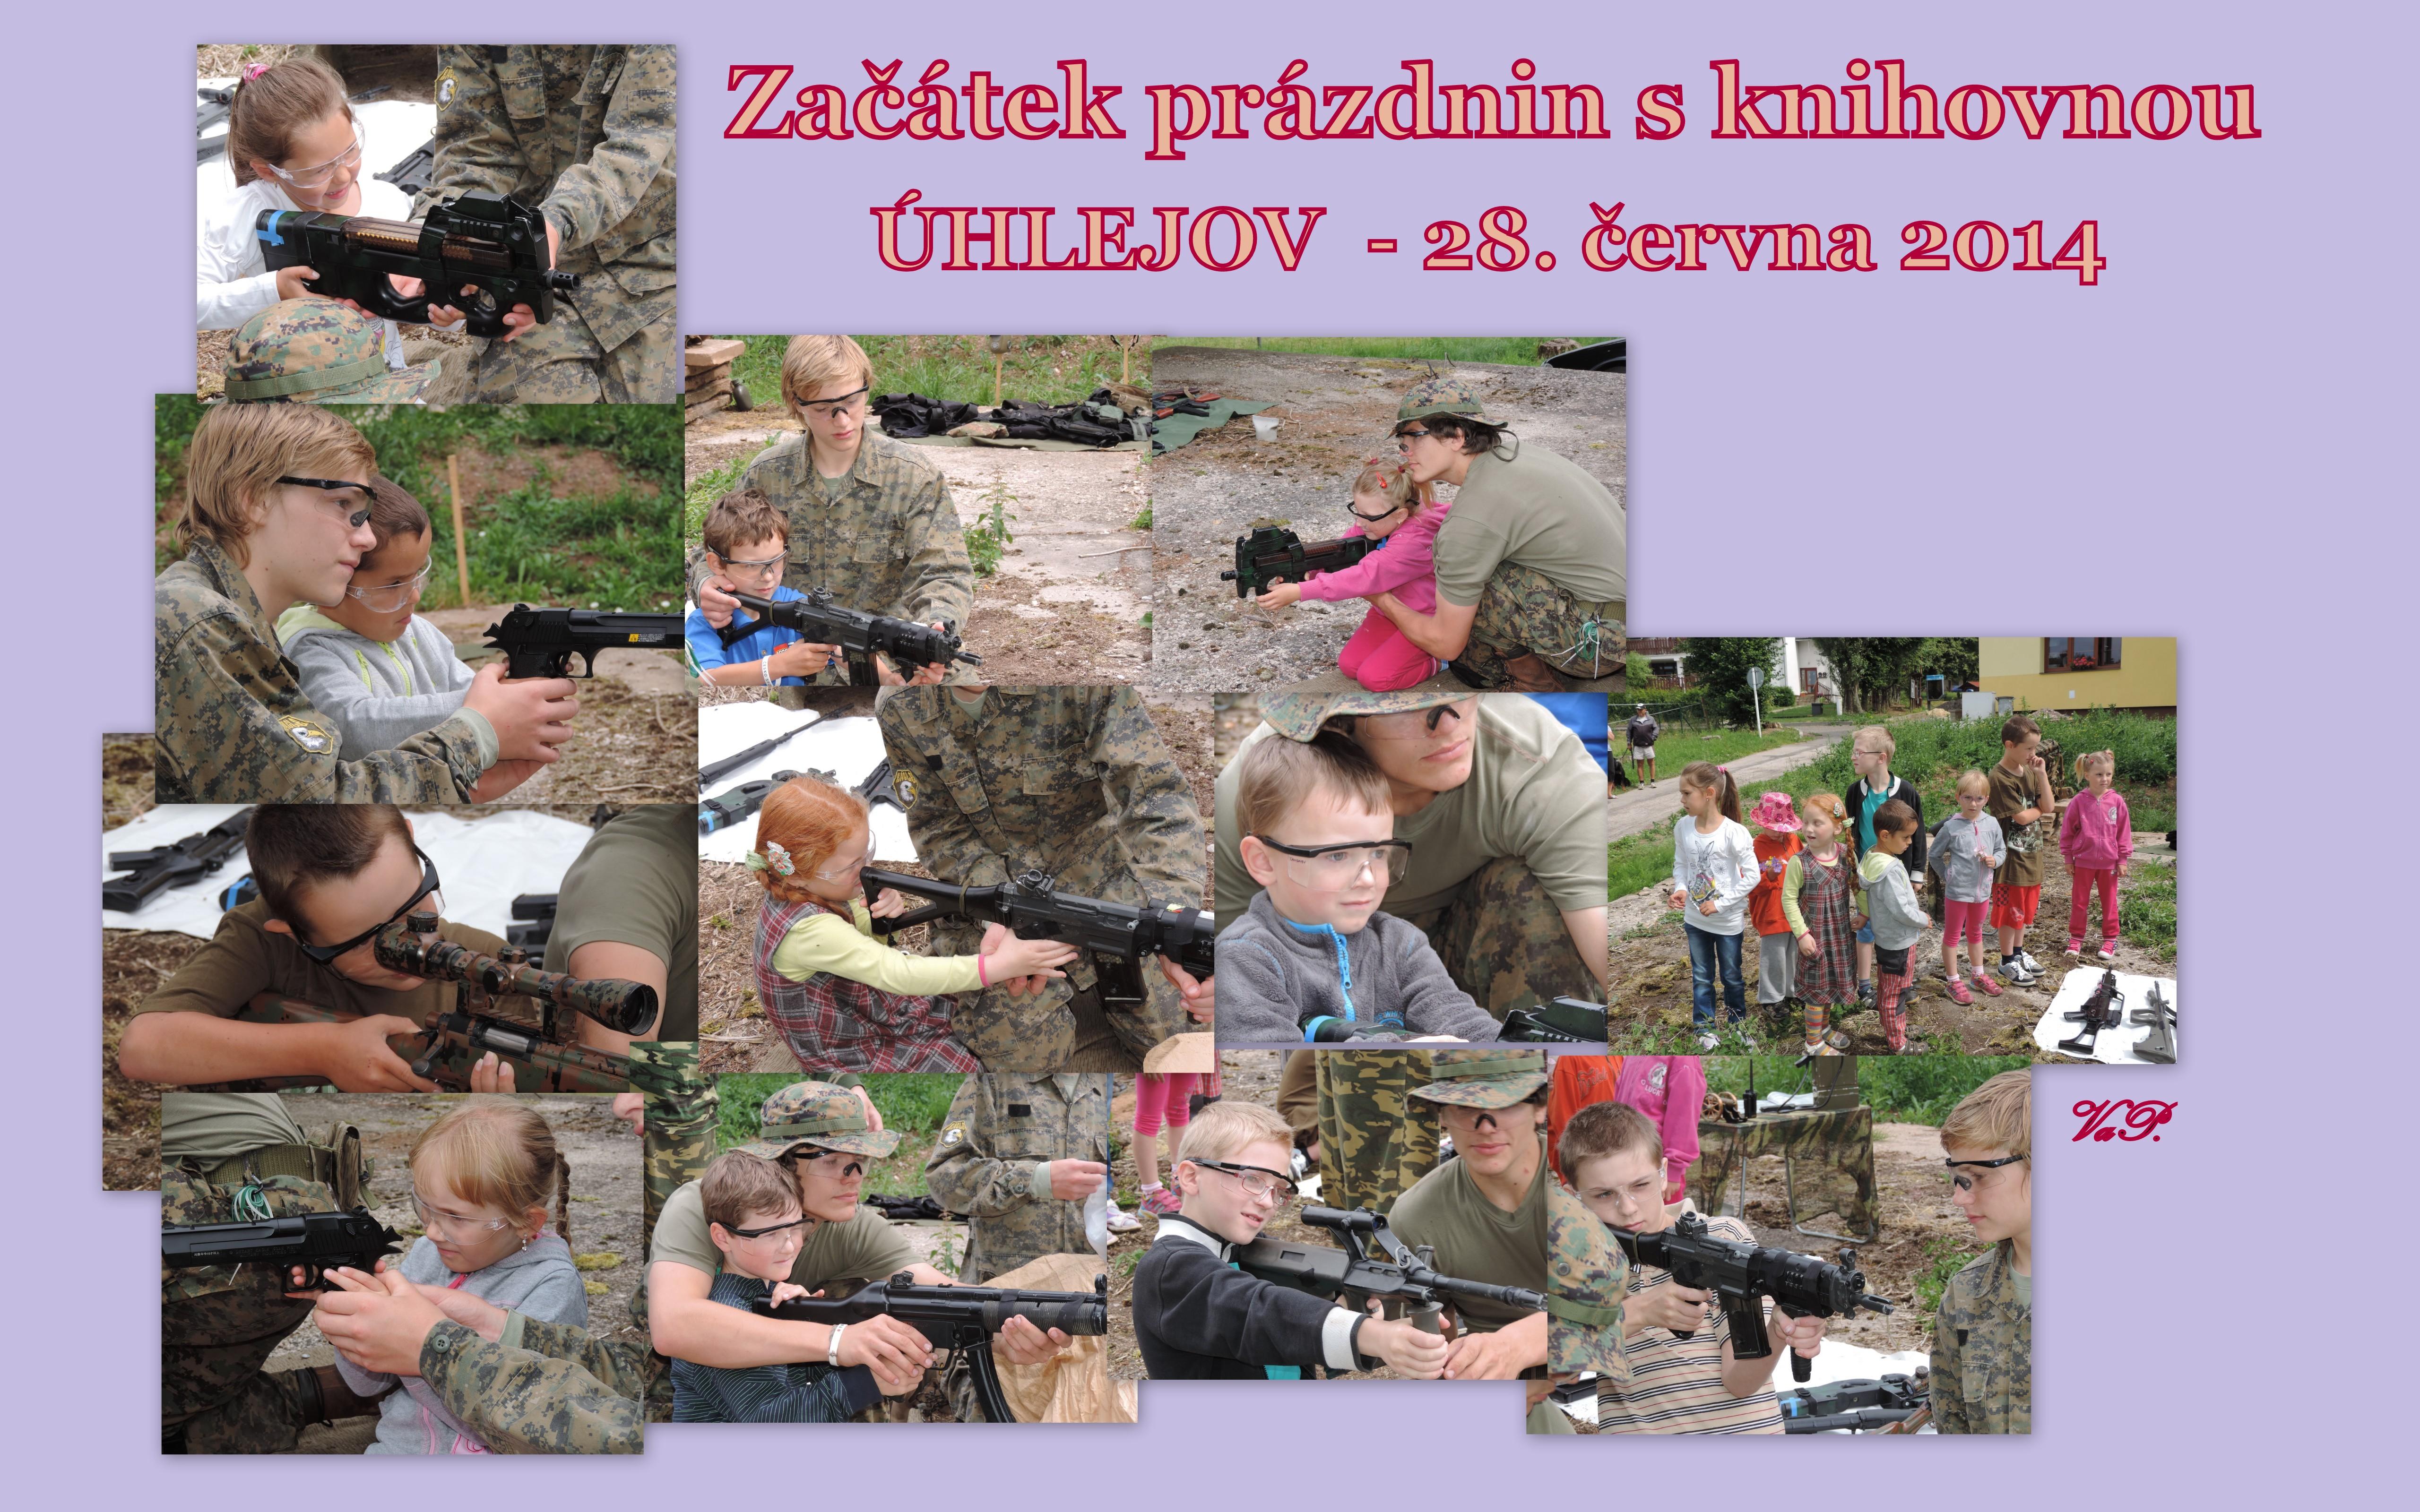 OBRÁZEK : zacatek_prazdnin_s_knihovnou_kolaz_3.jpg